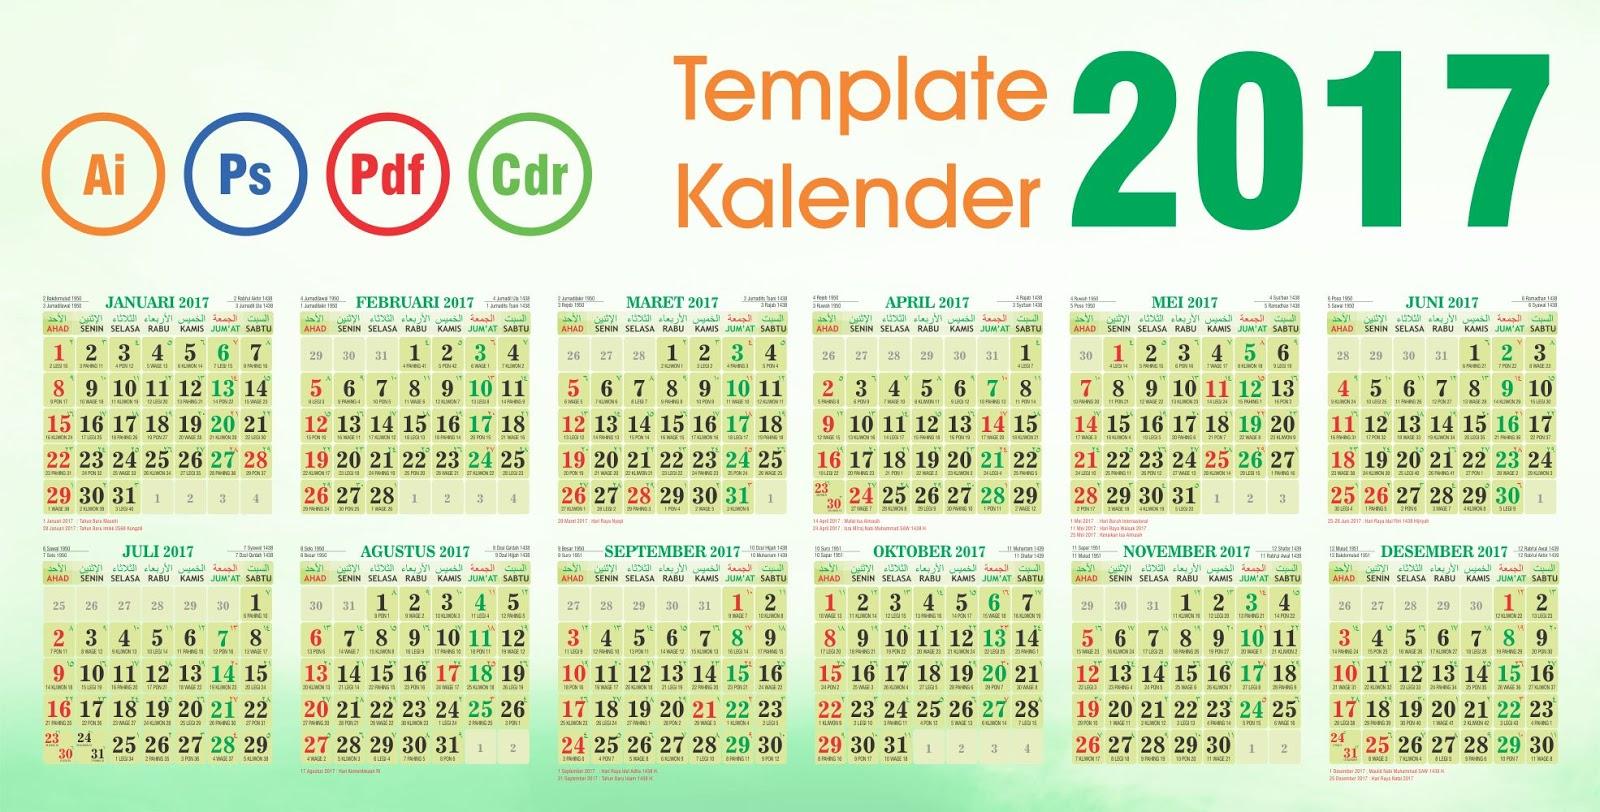 kalender+2017+indonesia+kalender+kerja+2017+cuti+bersama+2017+kalender ...